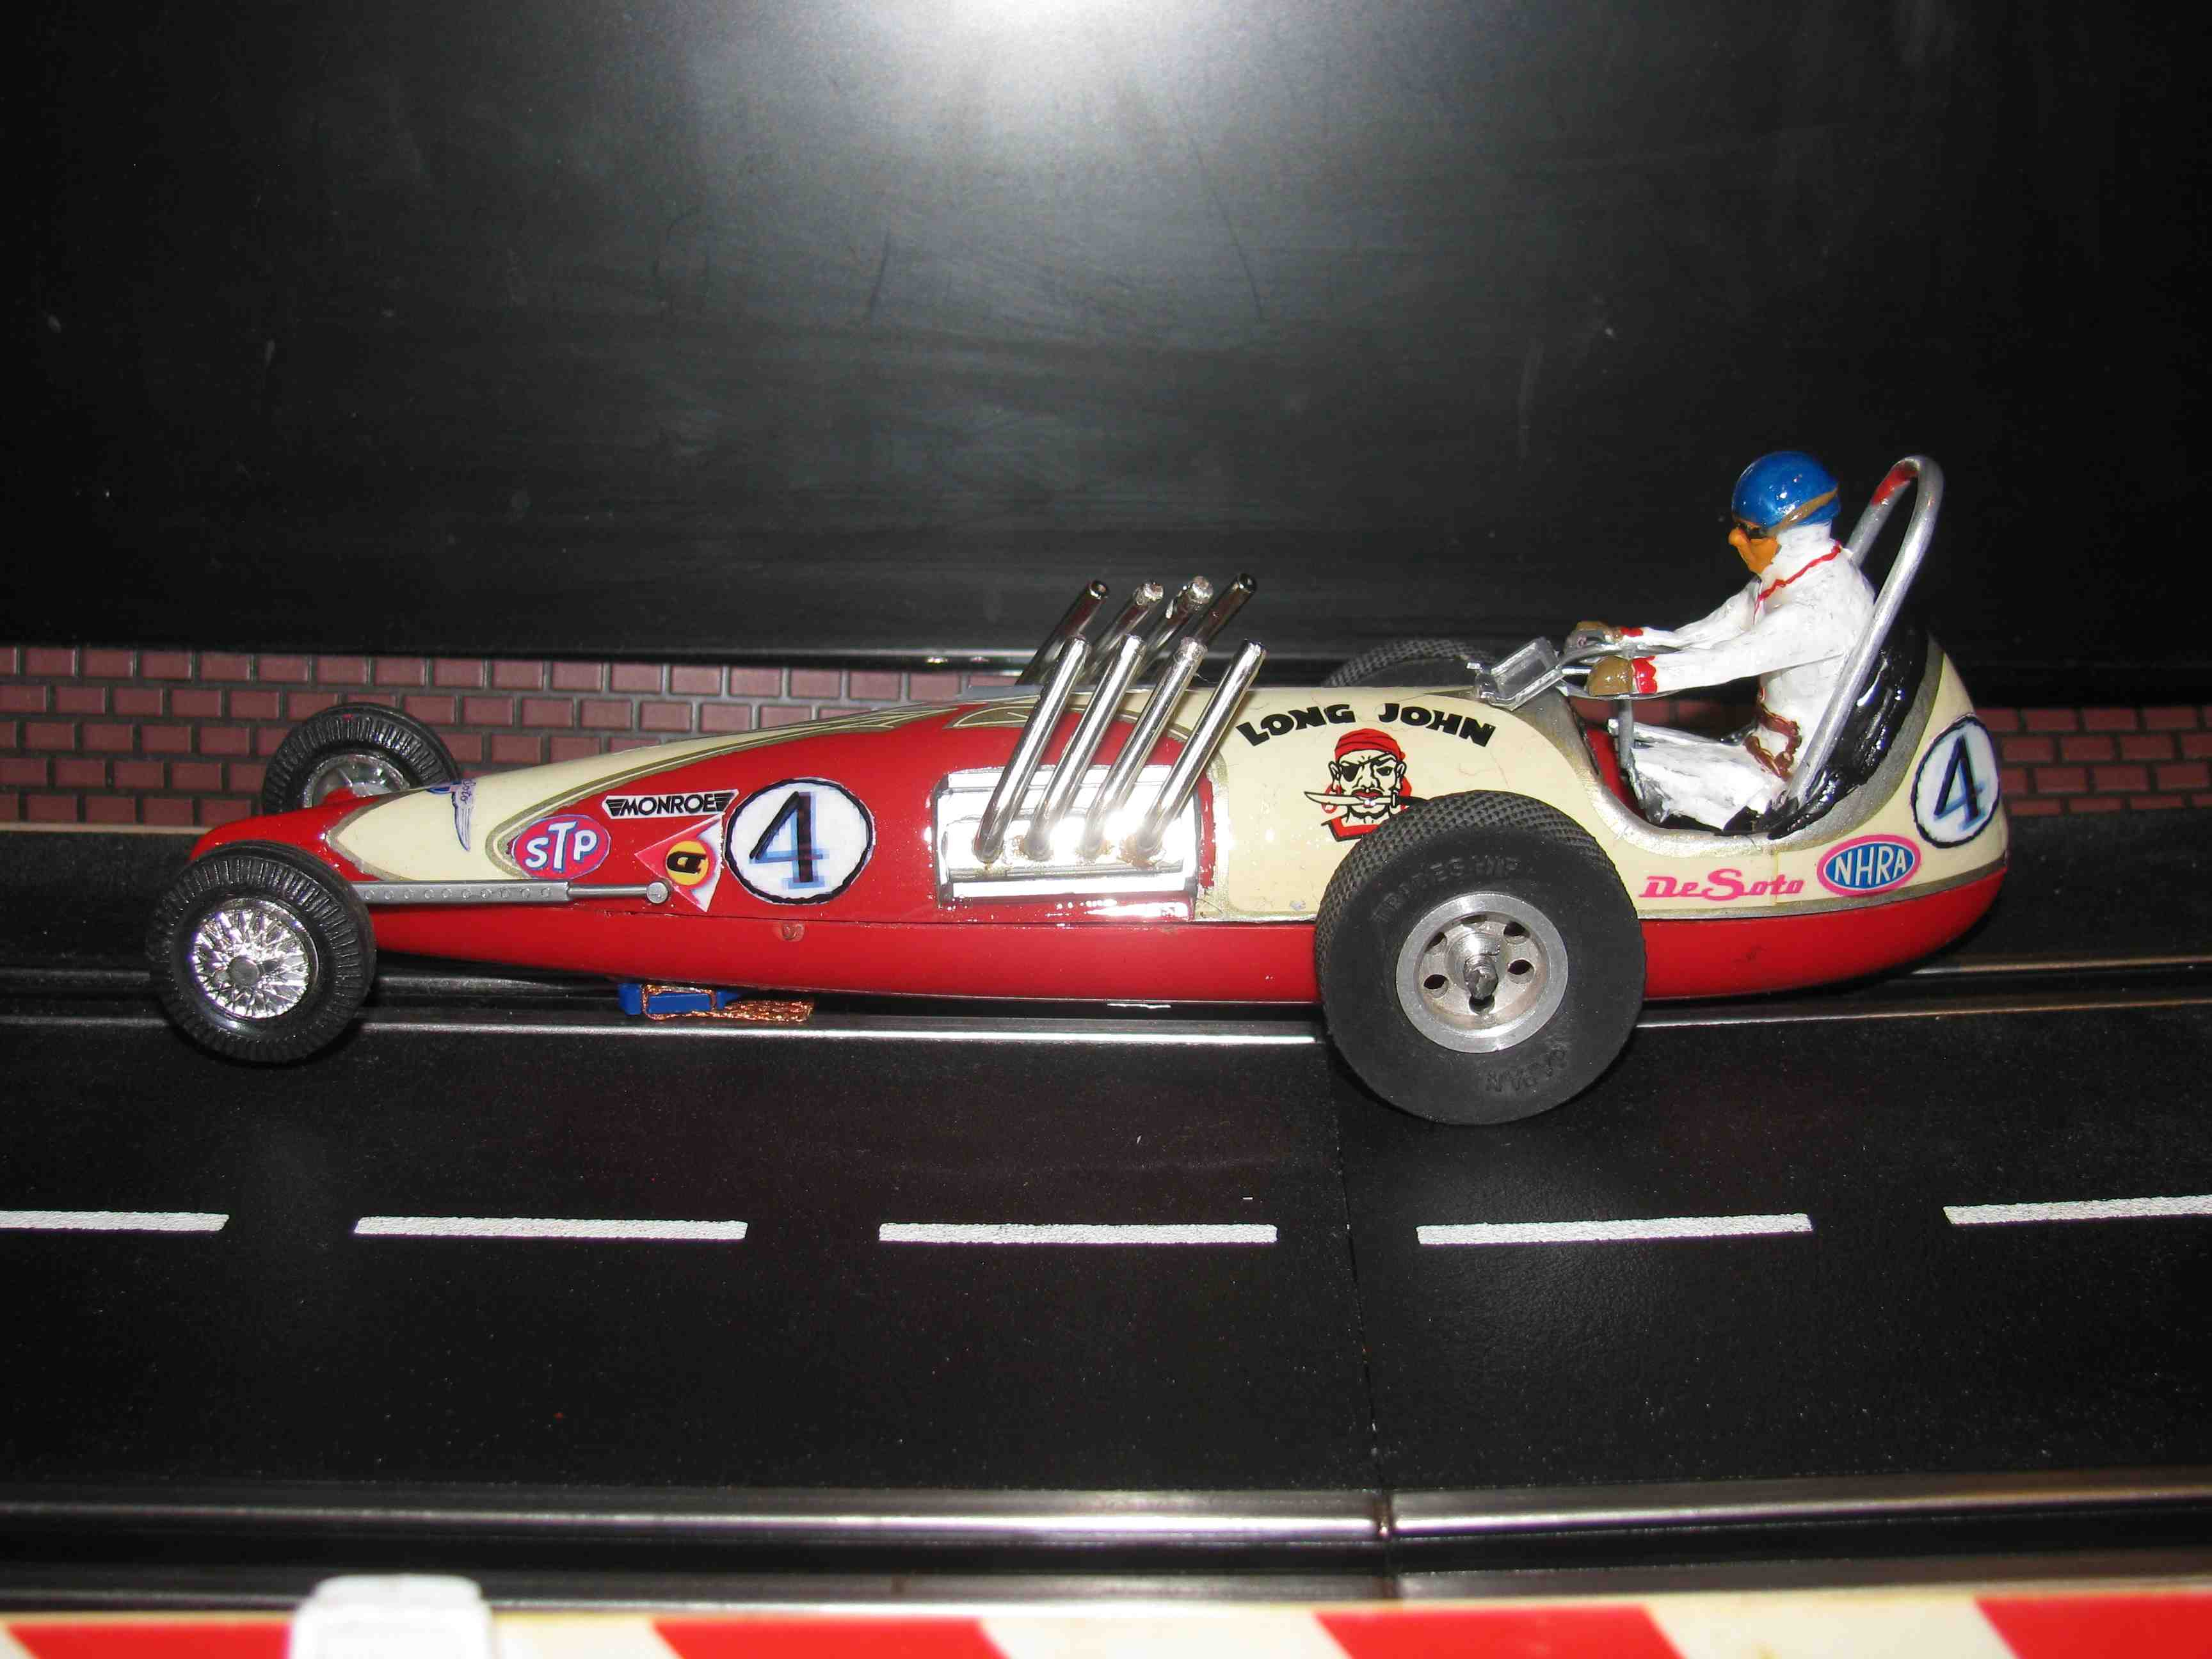 * SOLD * 1 Day Sale - Vintage Monogram Revell Long John Dragster Slot Car 1/32 Scale – Red – Car #4